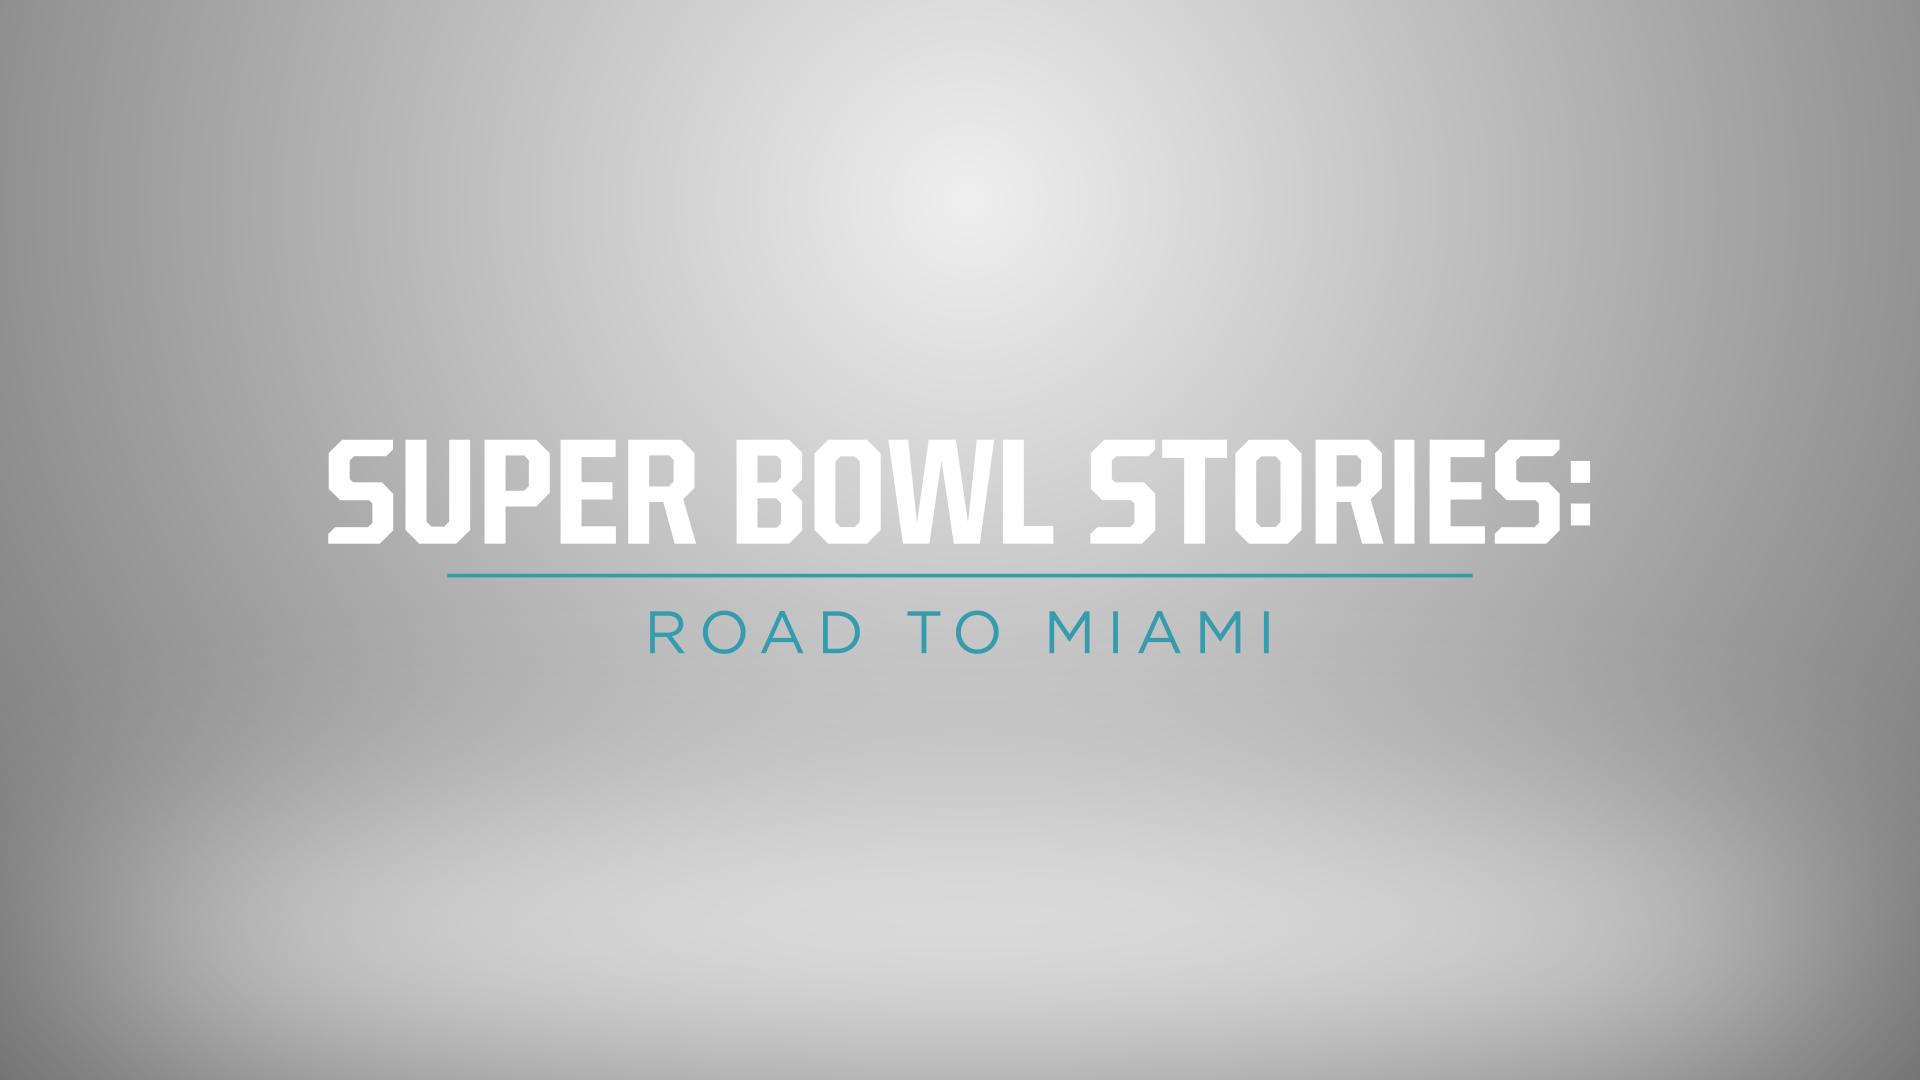 Super Bowl Stories Road To Miami Kicks Off Fox Sports 100 Day Countdown To Super Bowl Liv Fox Sports Presspass